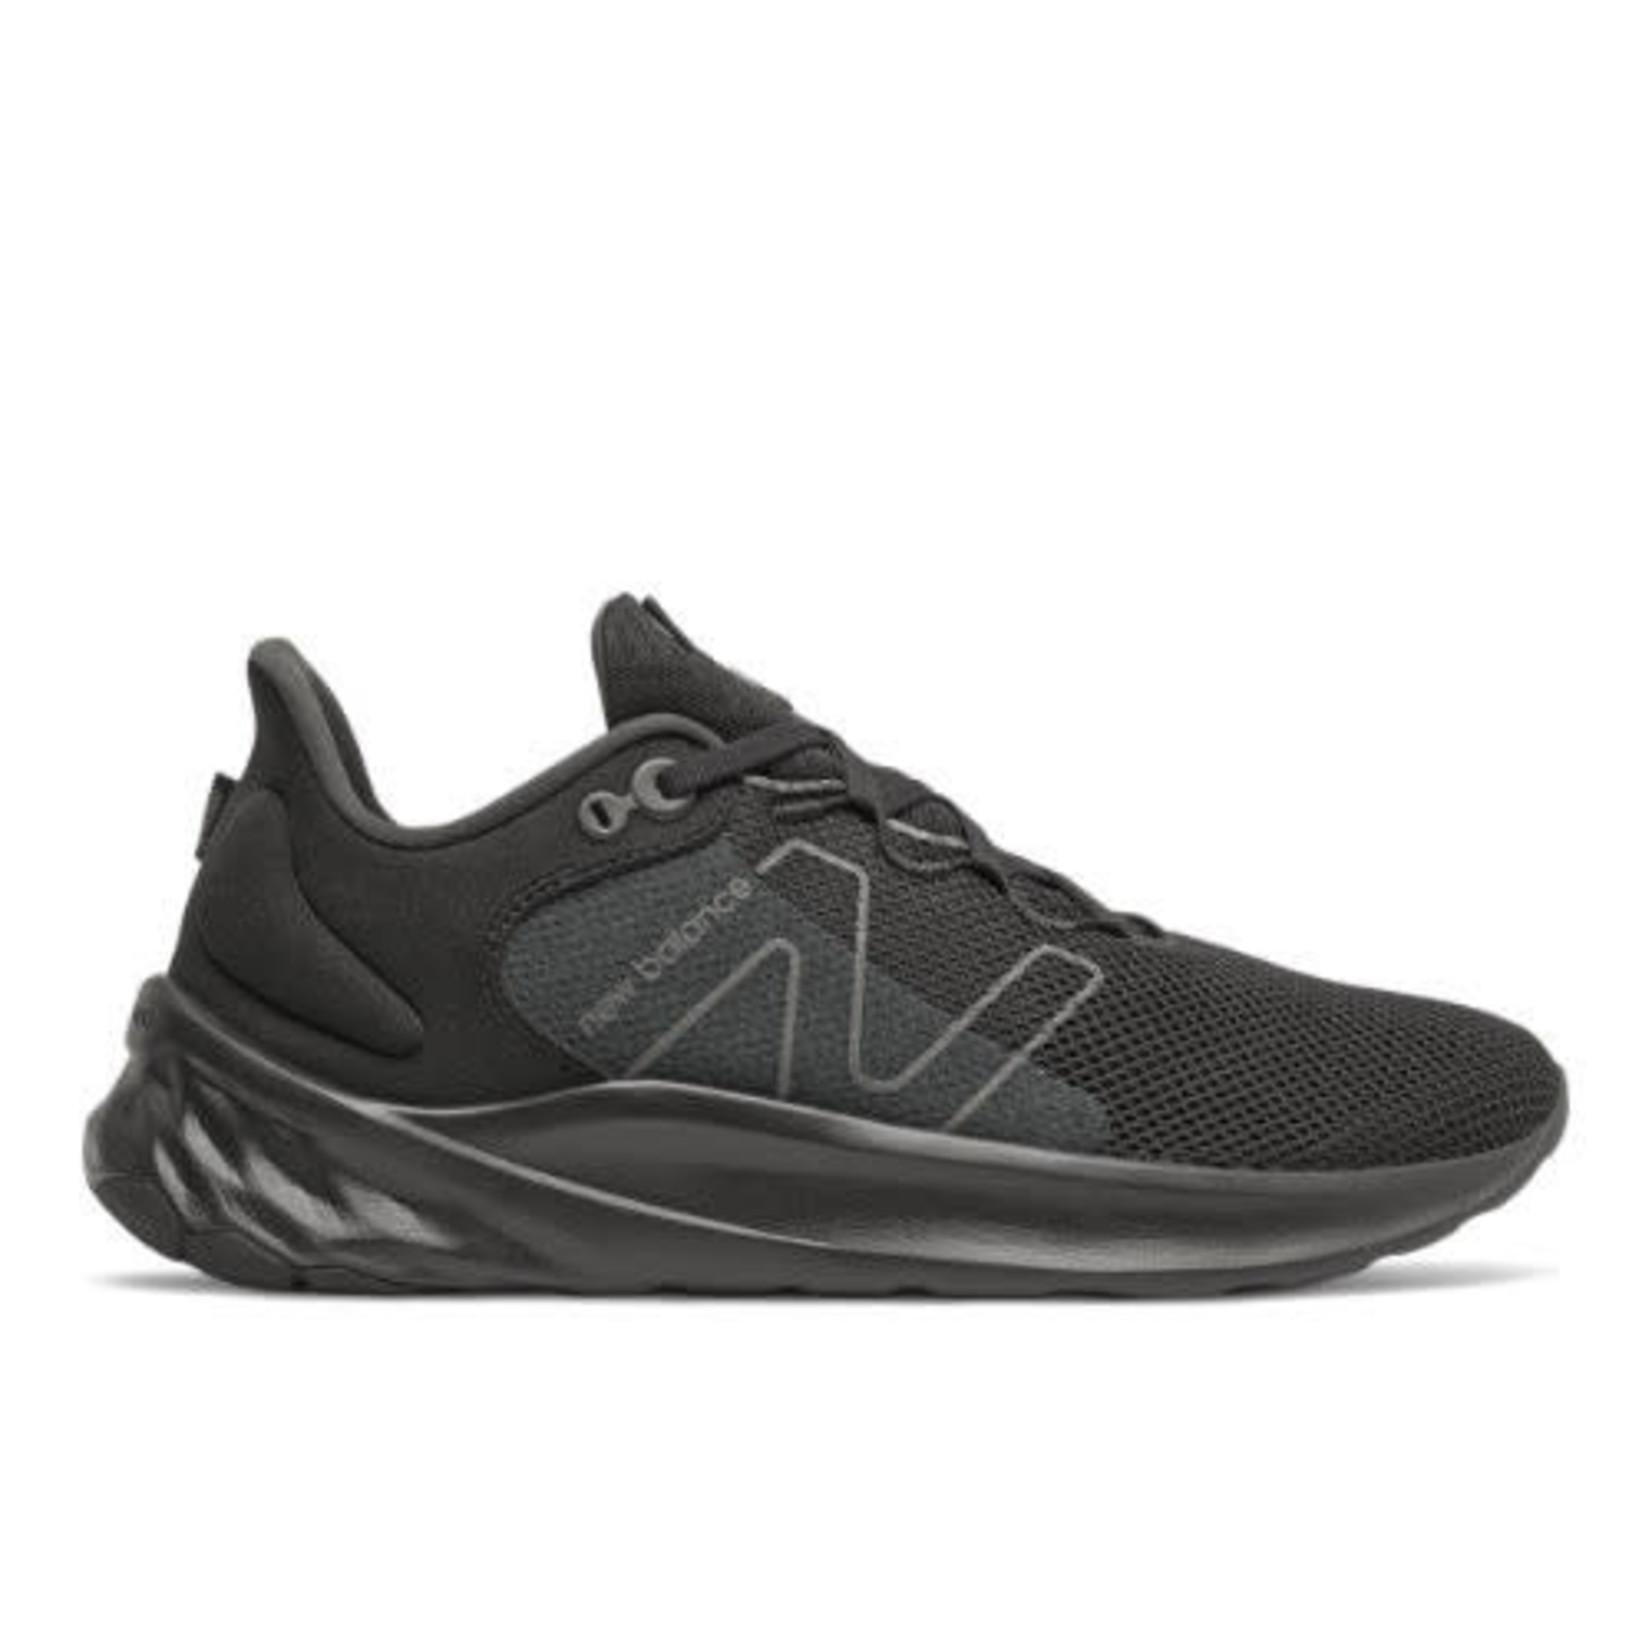 New Balance New Balance Running Shoes, Roav v2, Mens